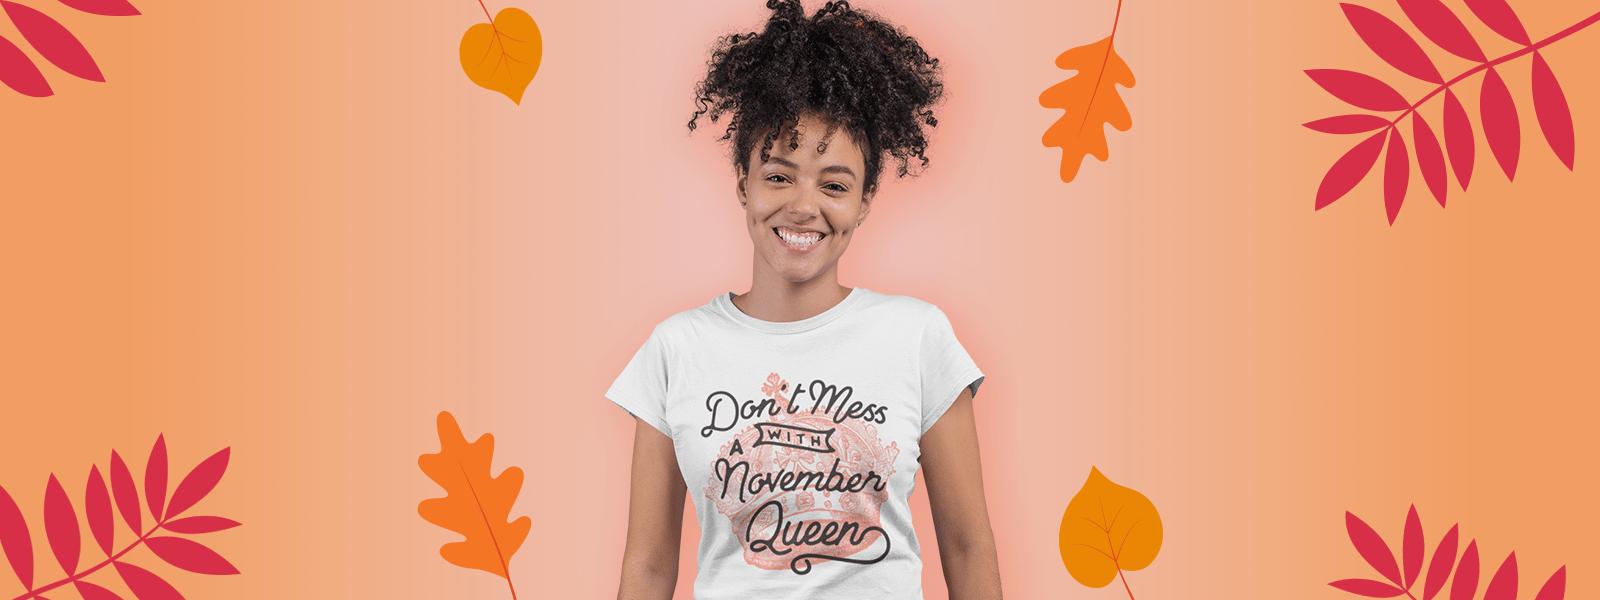 Ultimate November Birthday Gift Ideas